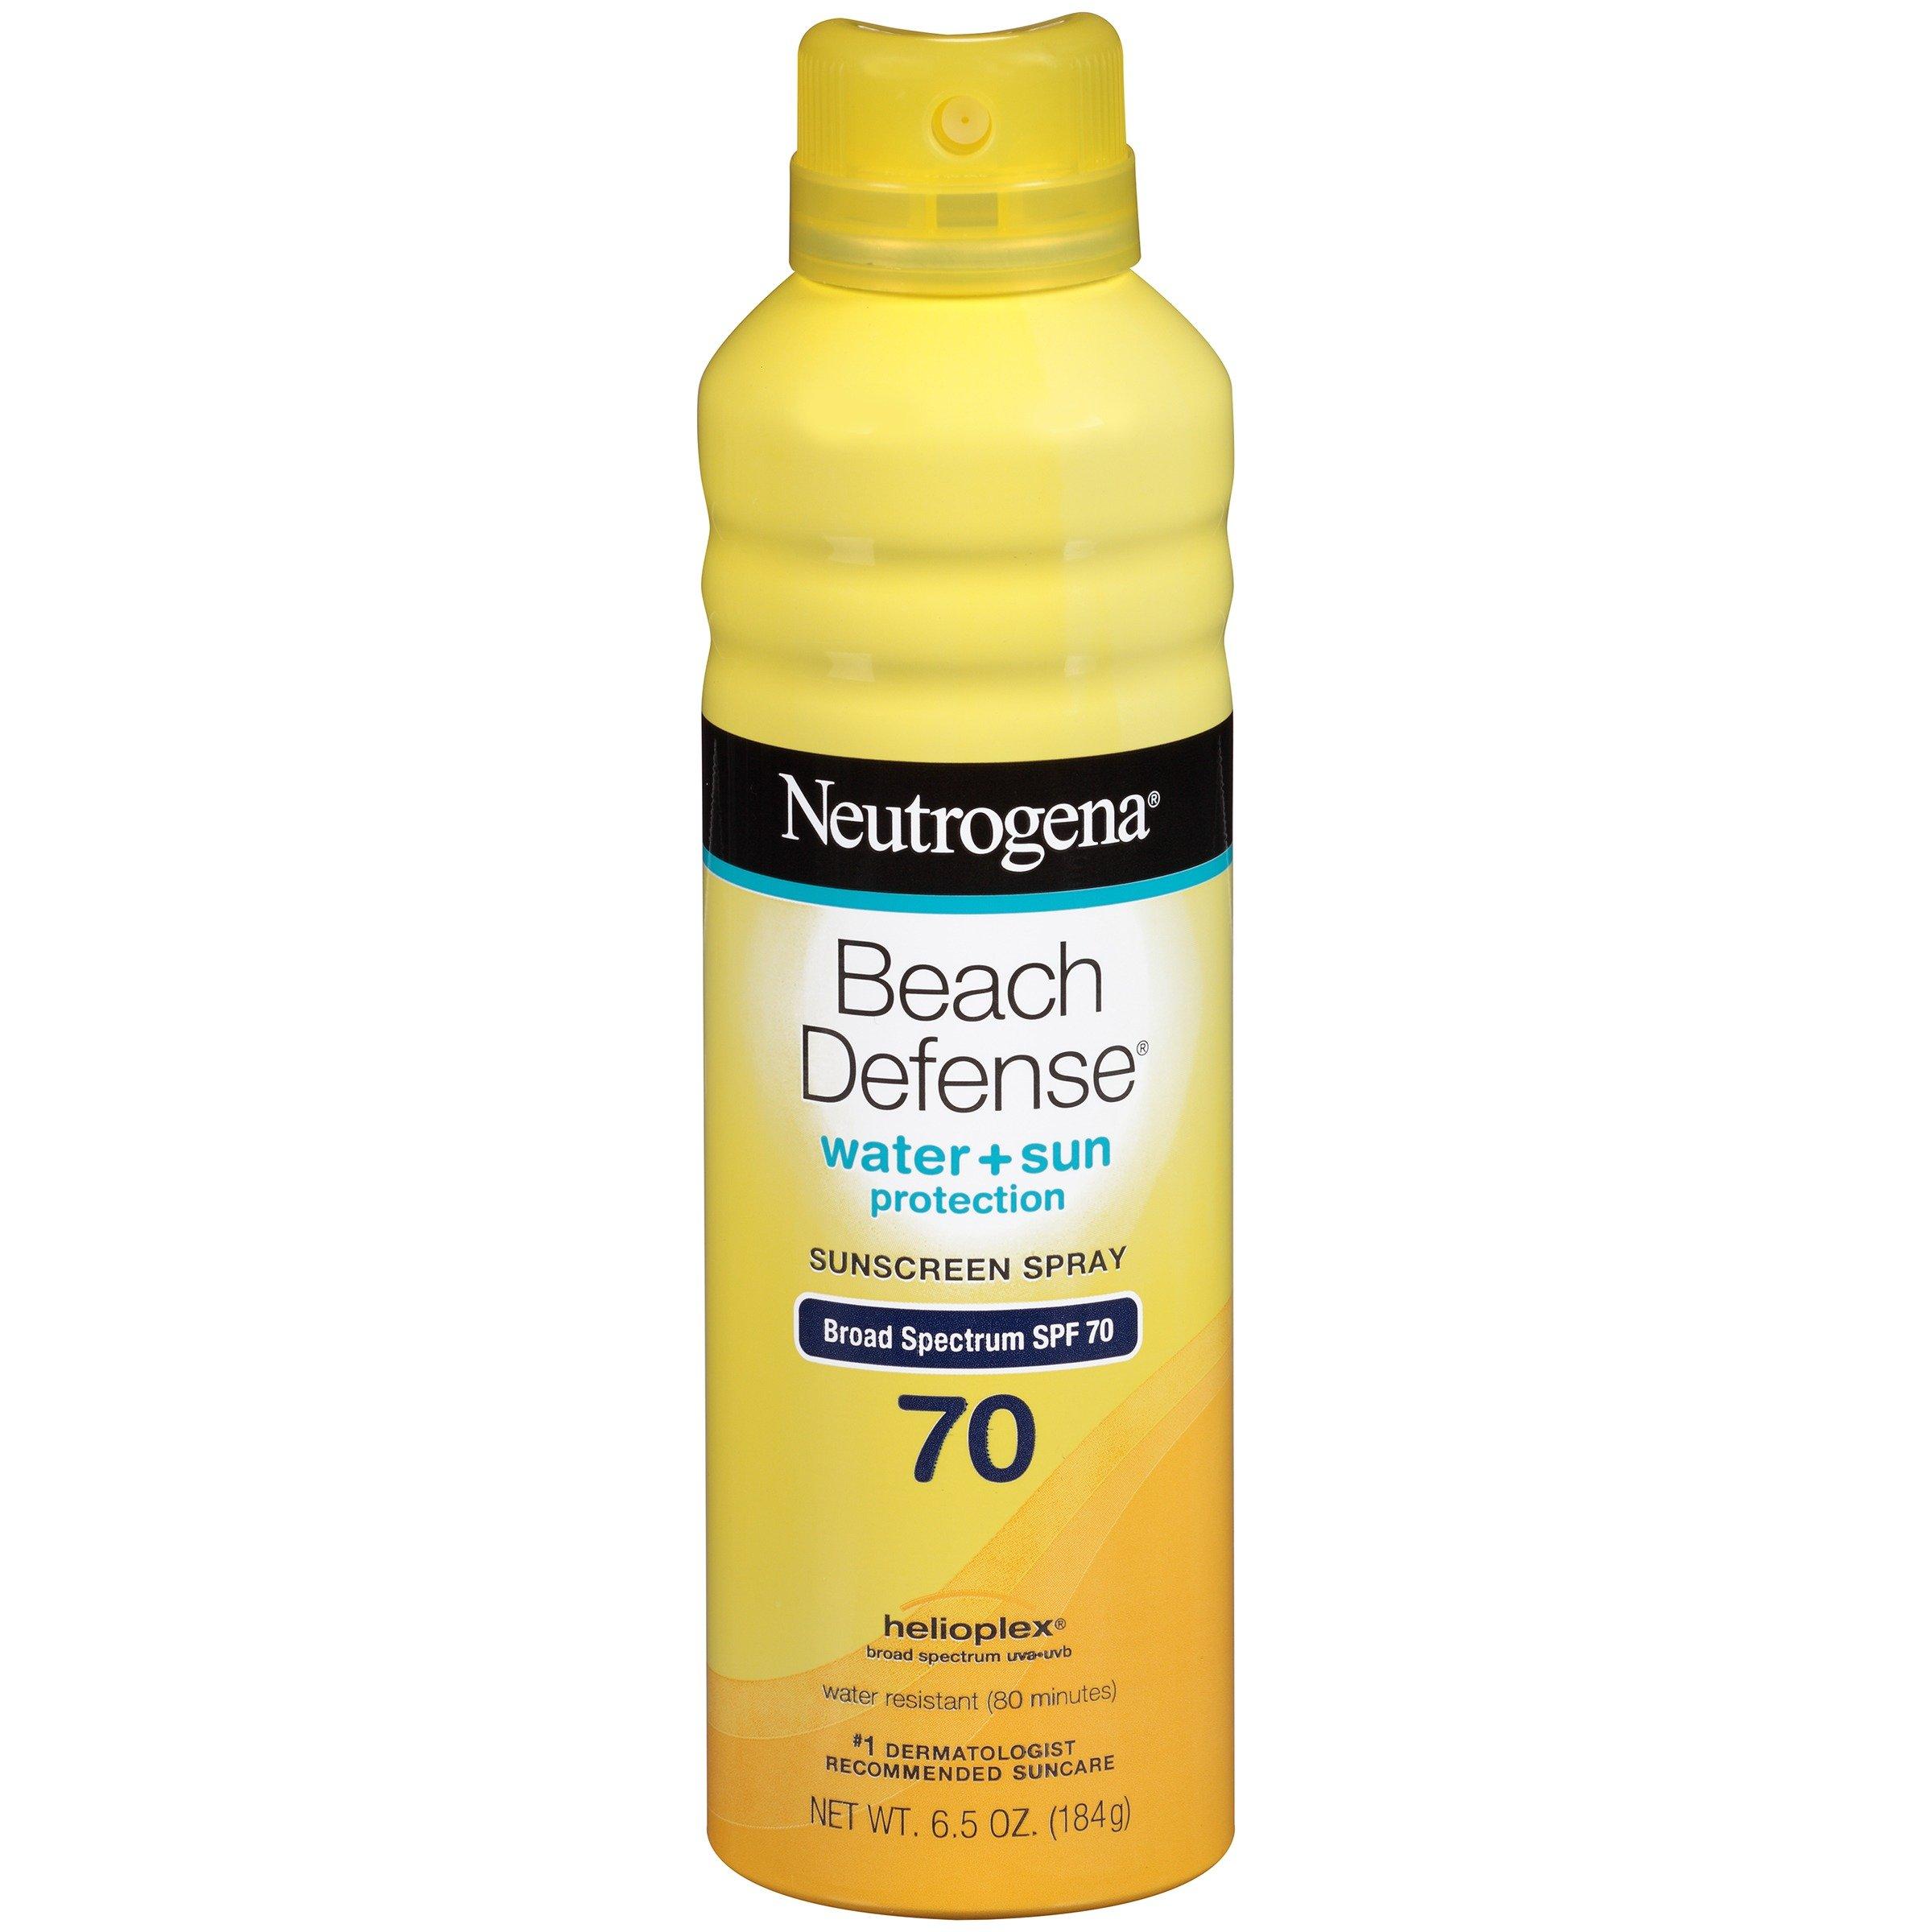 Neutrogena Beach Defense Spray Sunscreen Broad Spectrum SPF 70, 6.5 Ounce (Pack Of 3)